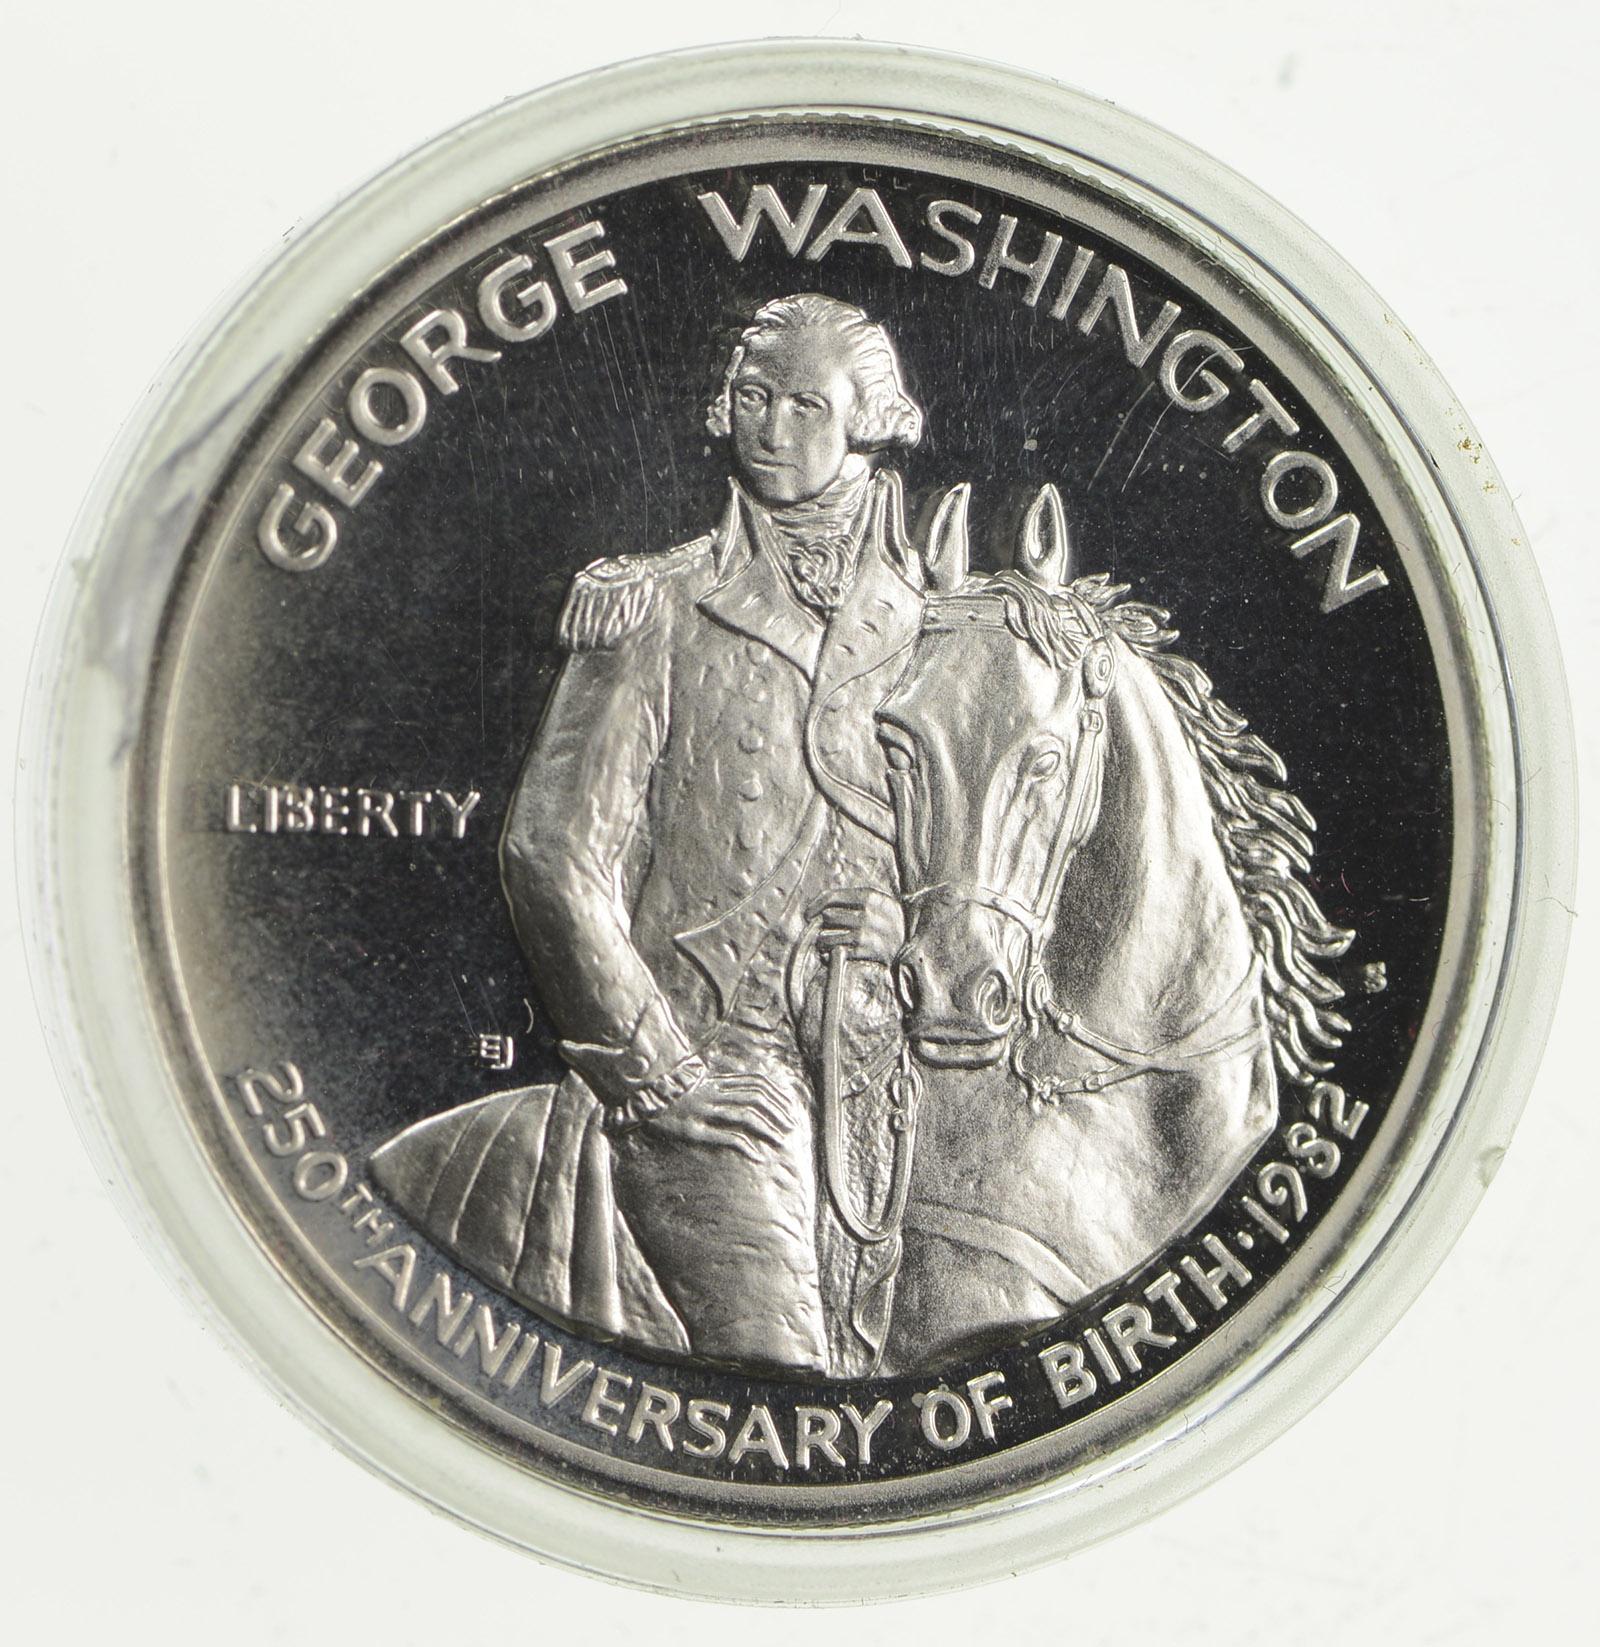 george washington 1982 commemorative coin